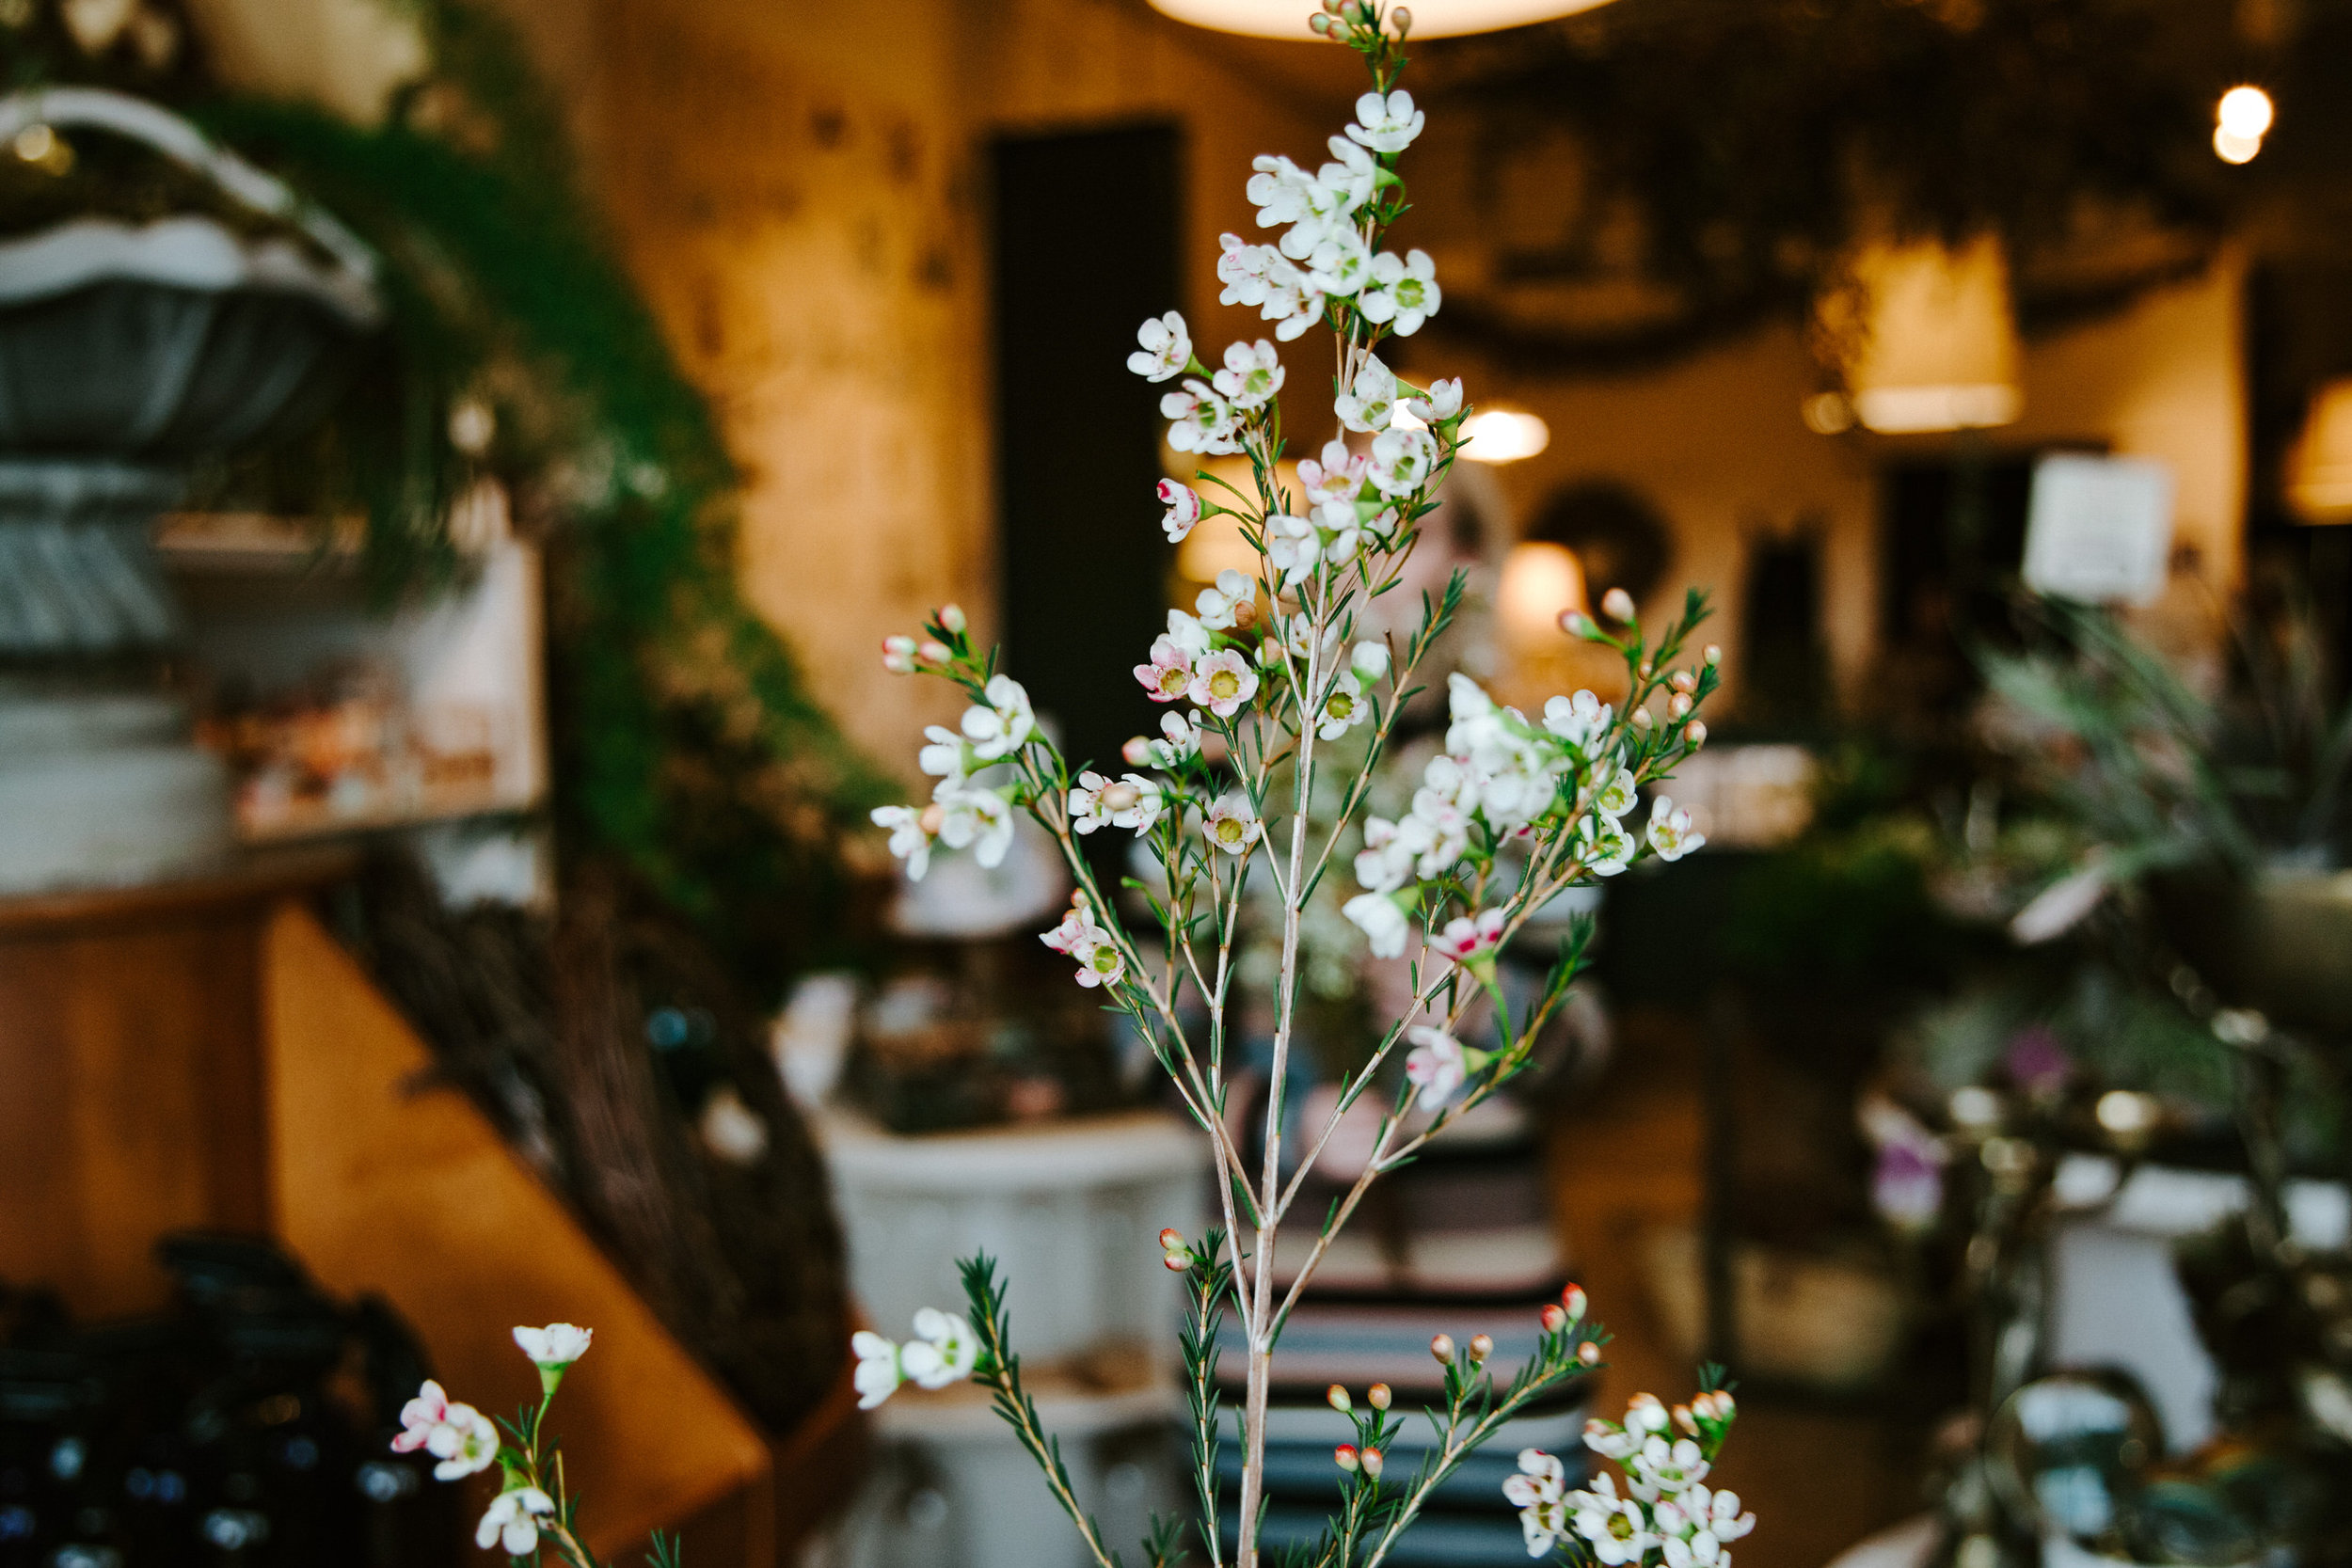 stem-hes+flora-4283.jpg